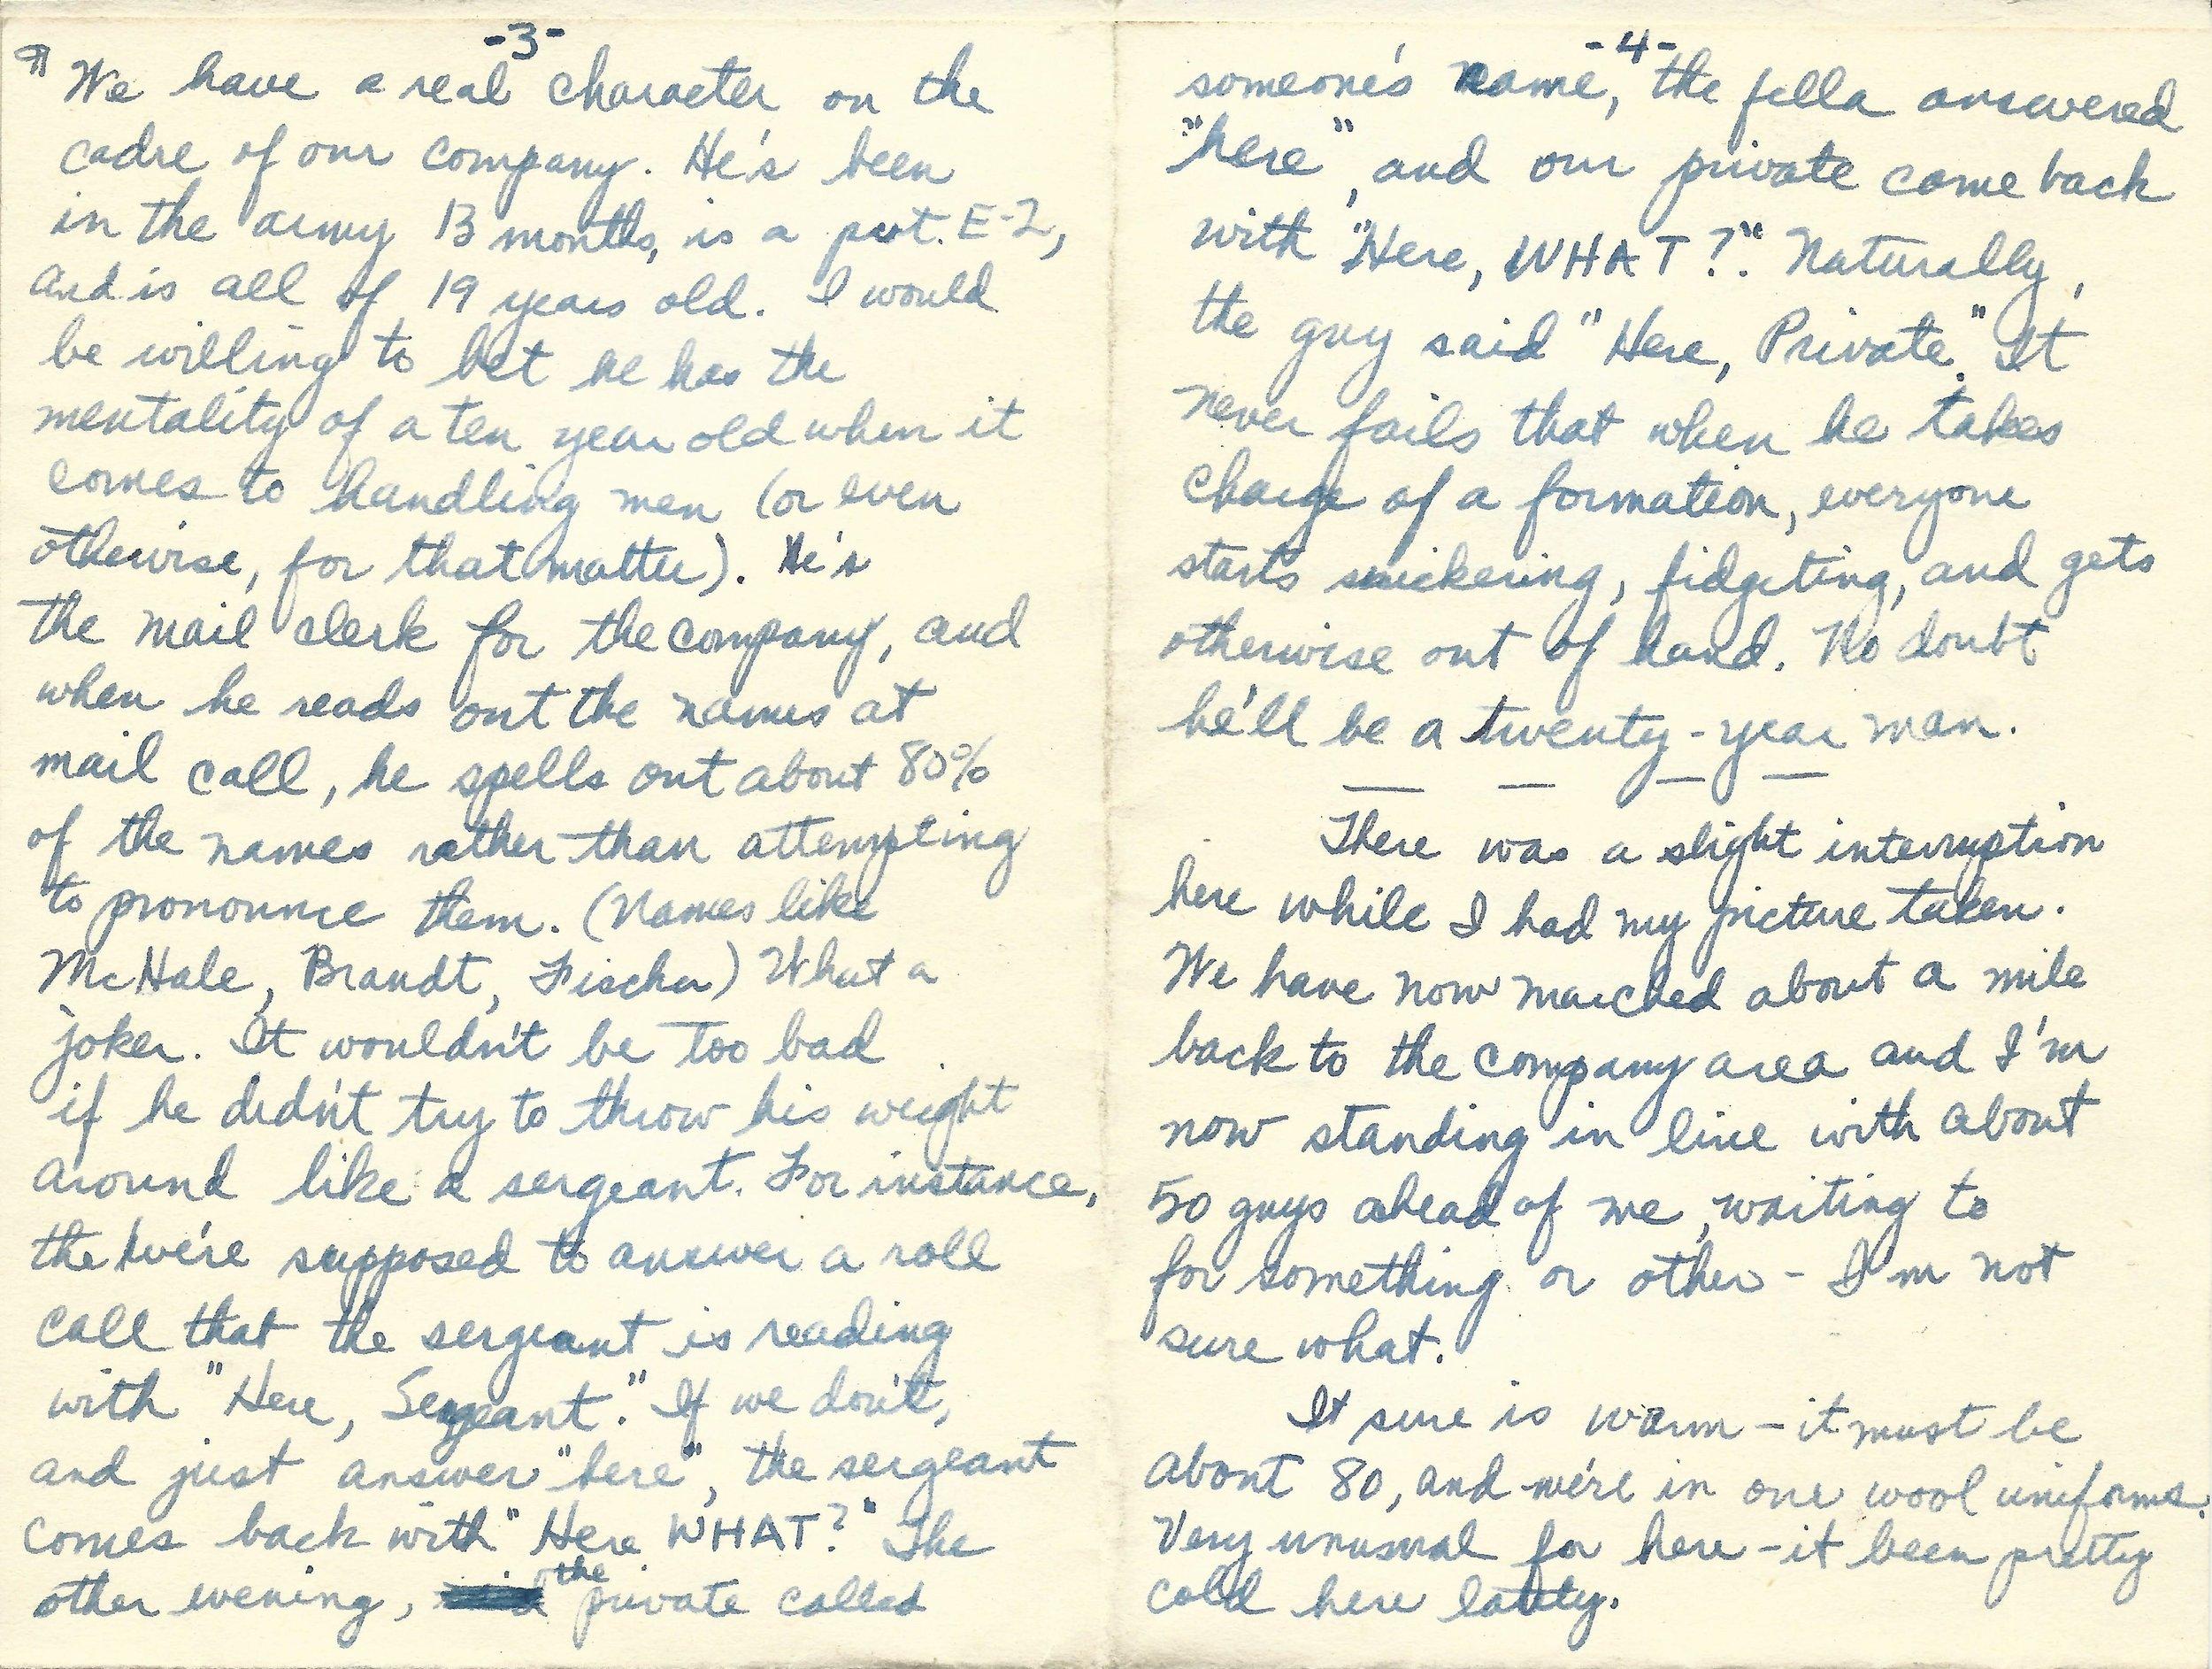 9. Oct. 24, 1952 (Opa)_Page_3.jpg